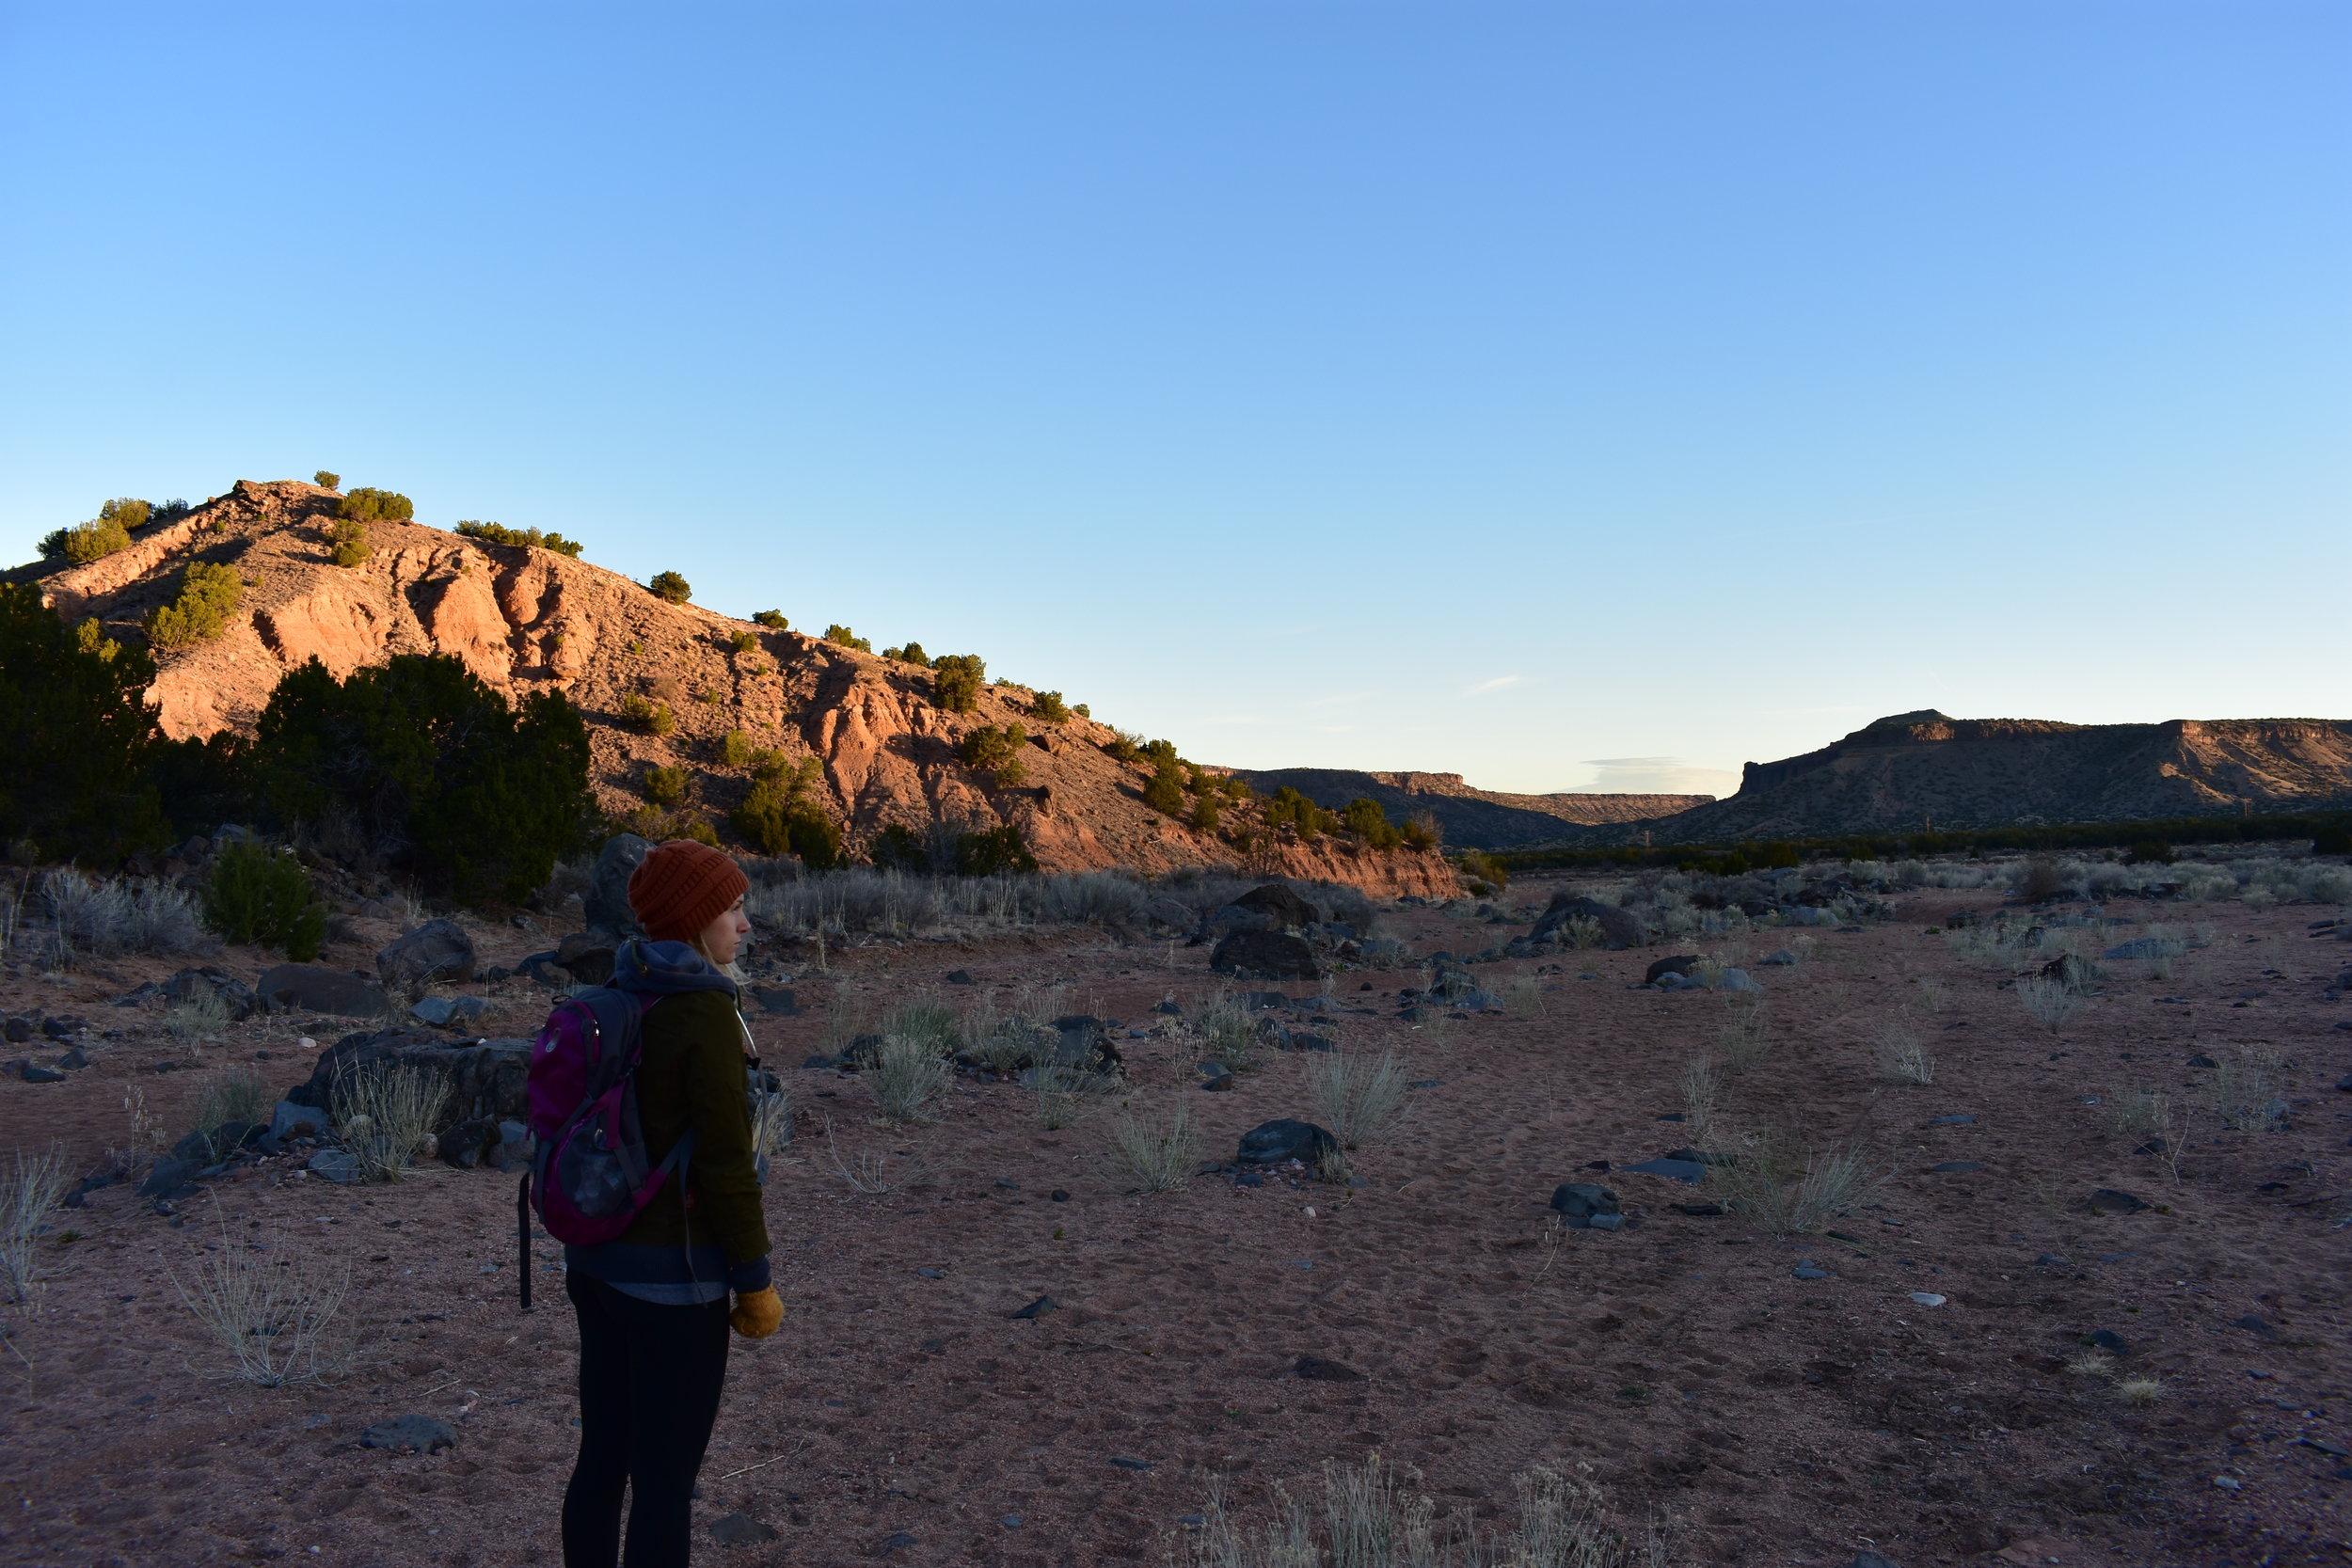 Diablo Canyon - Santa Fe